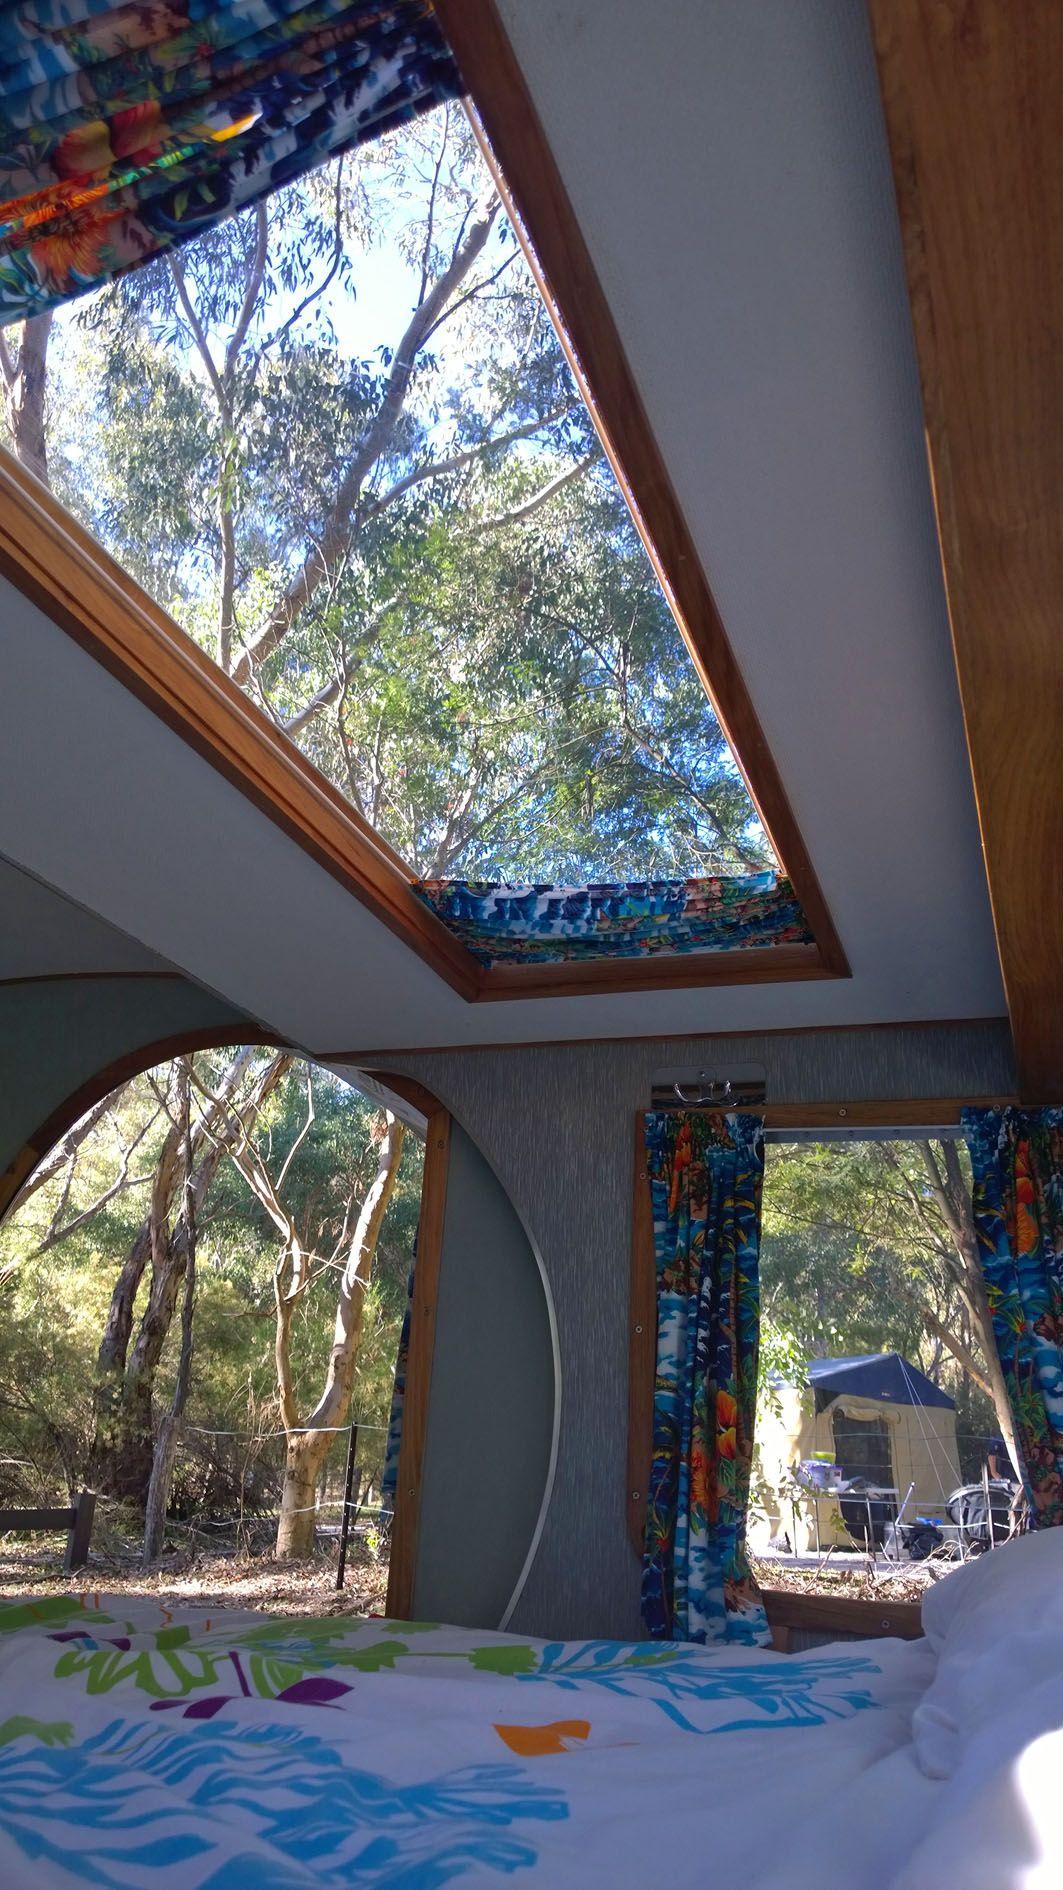 Girraween national park teardrop camper interior diy